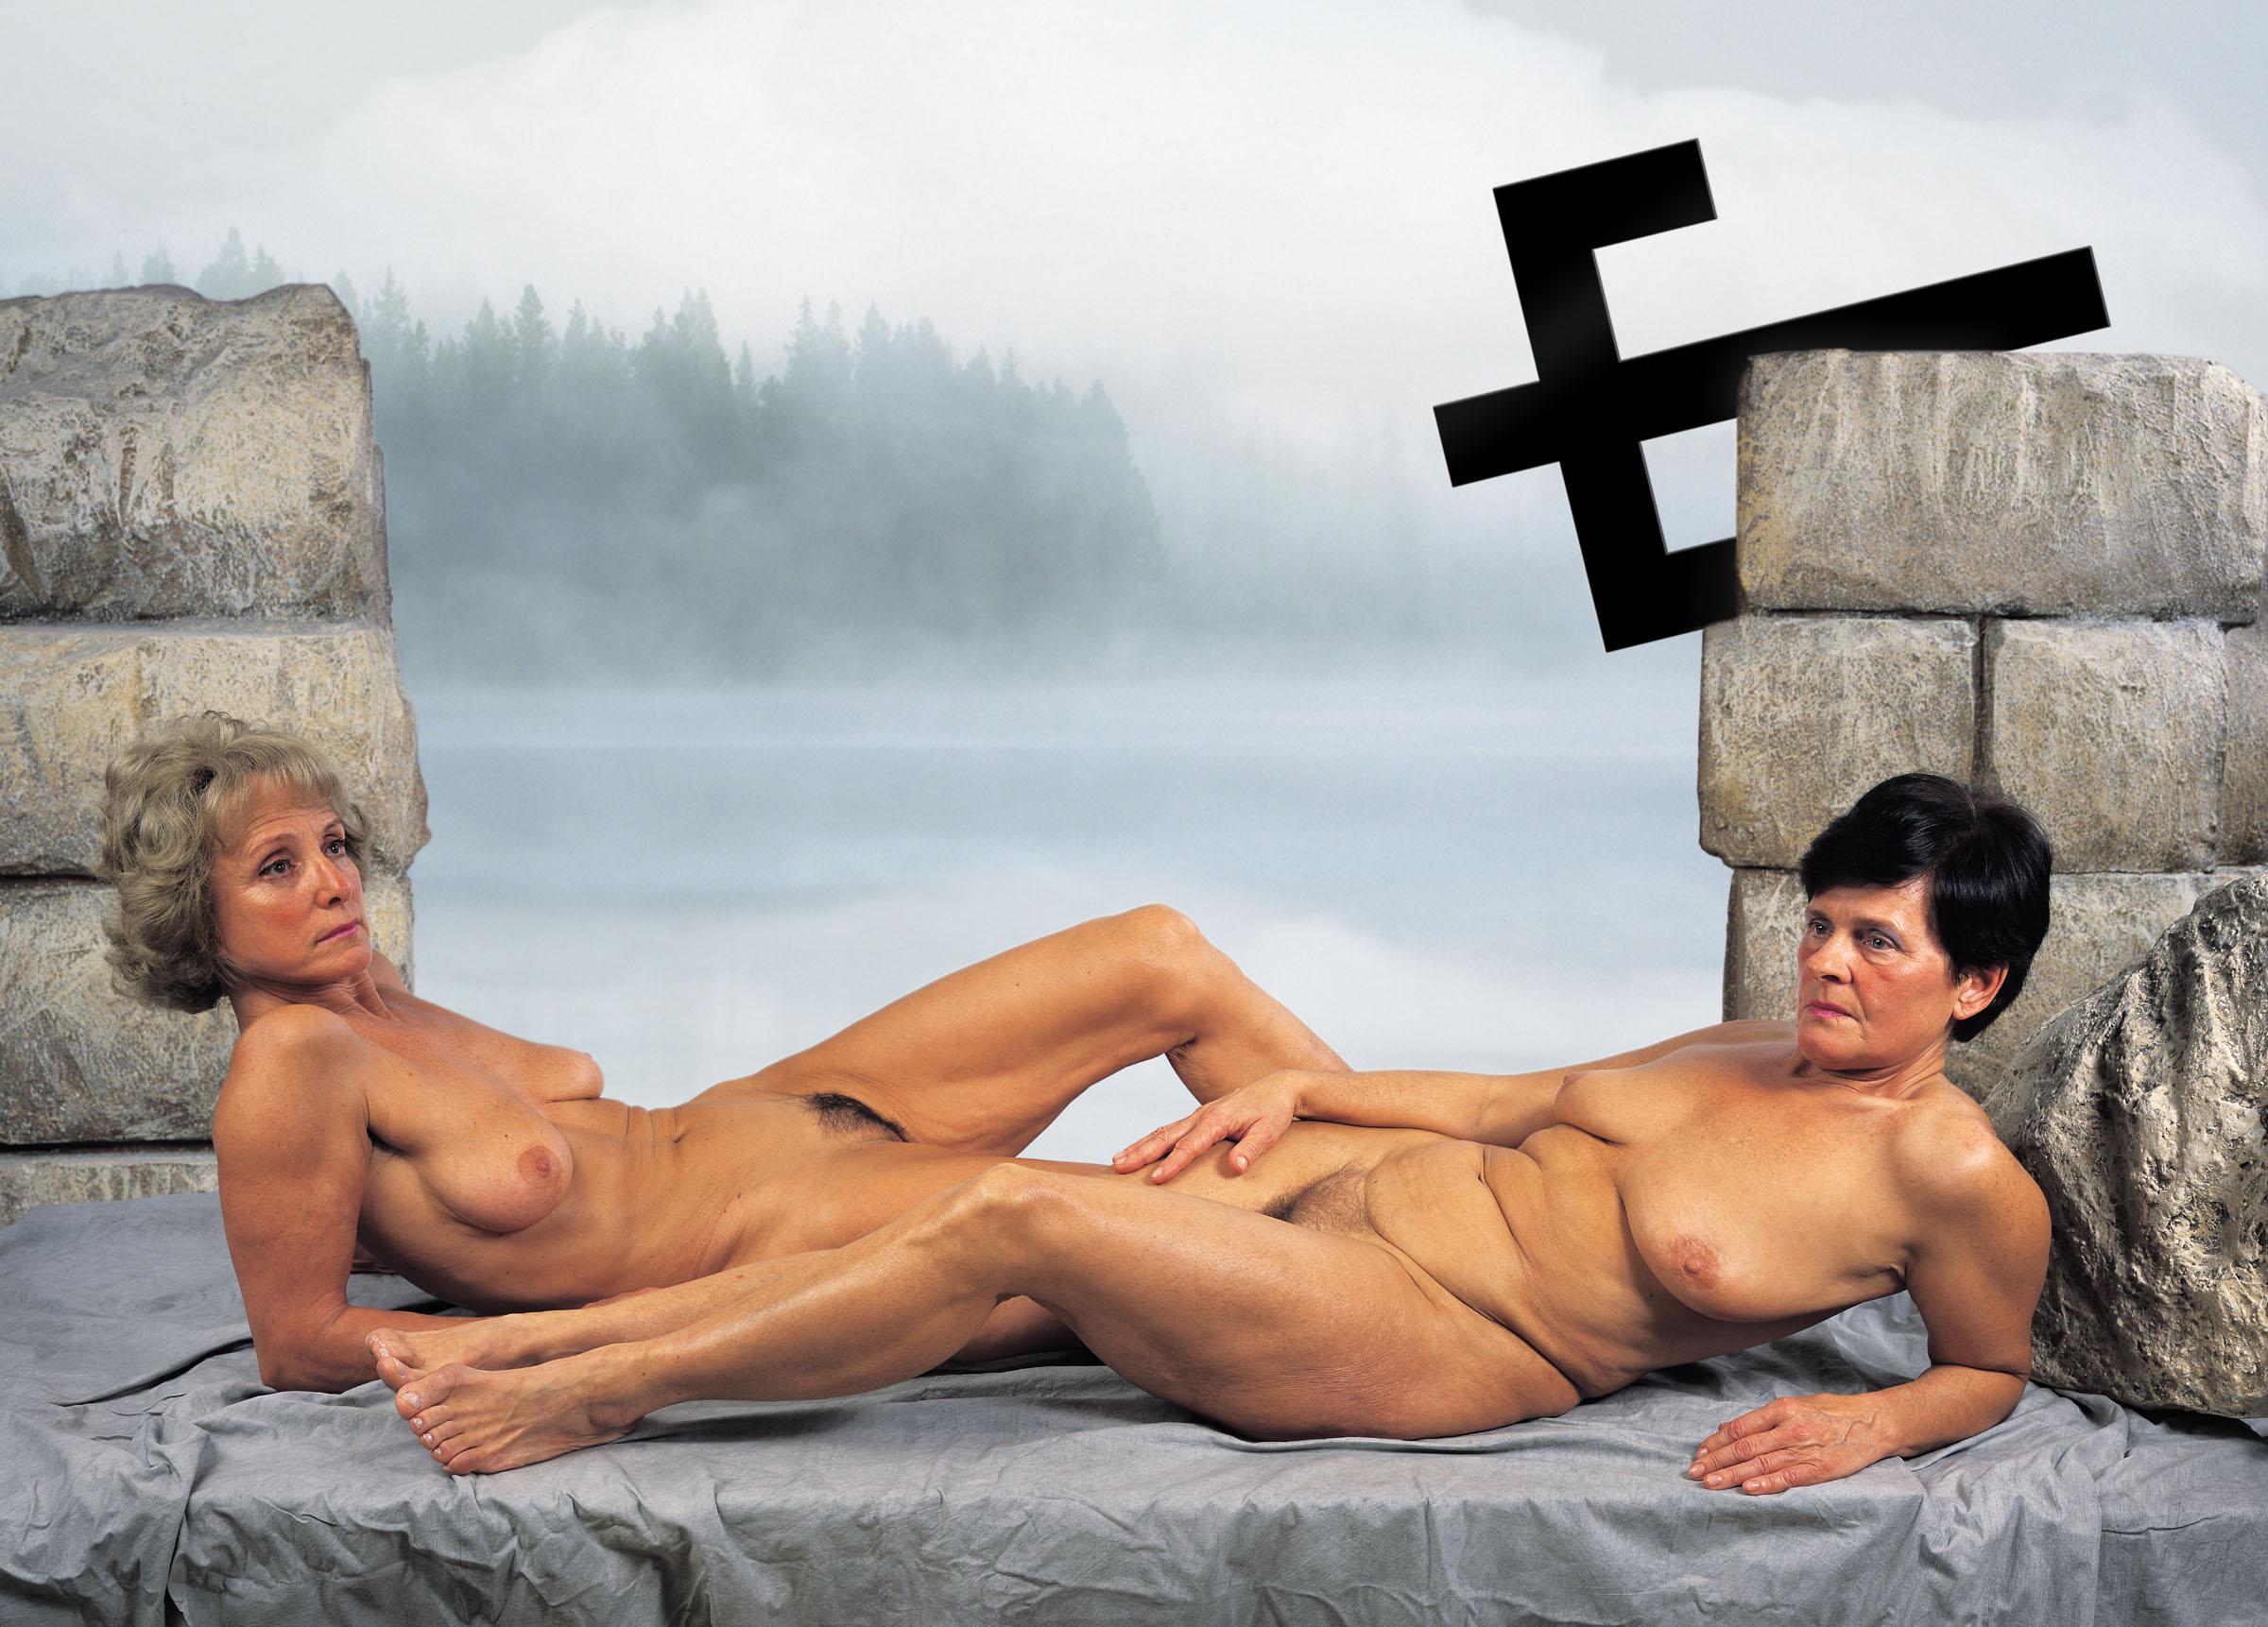 Pihenő anyák, 2004, giclée print, 70 x 94 cm © Gerhes Gábor